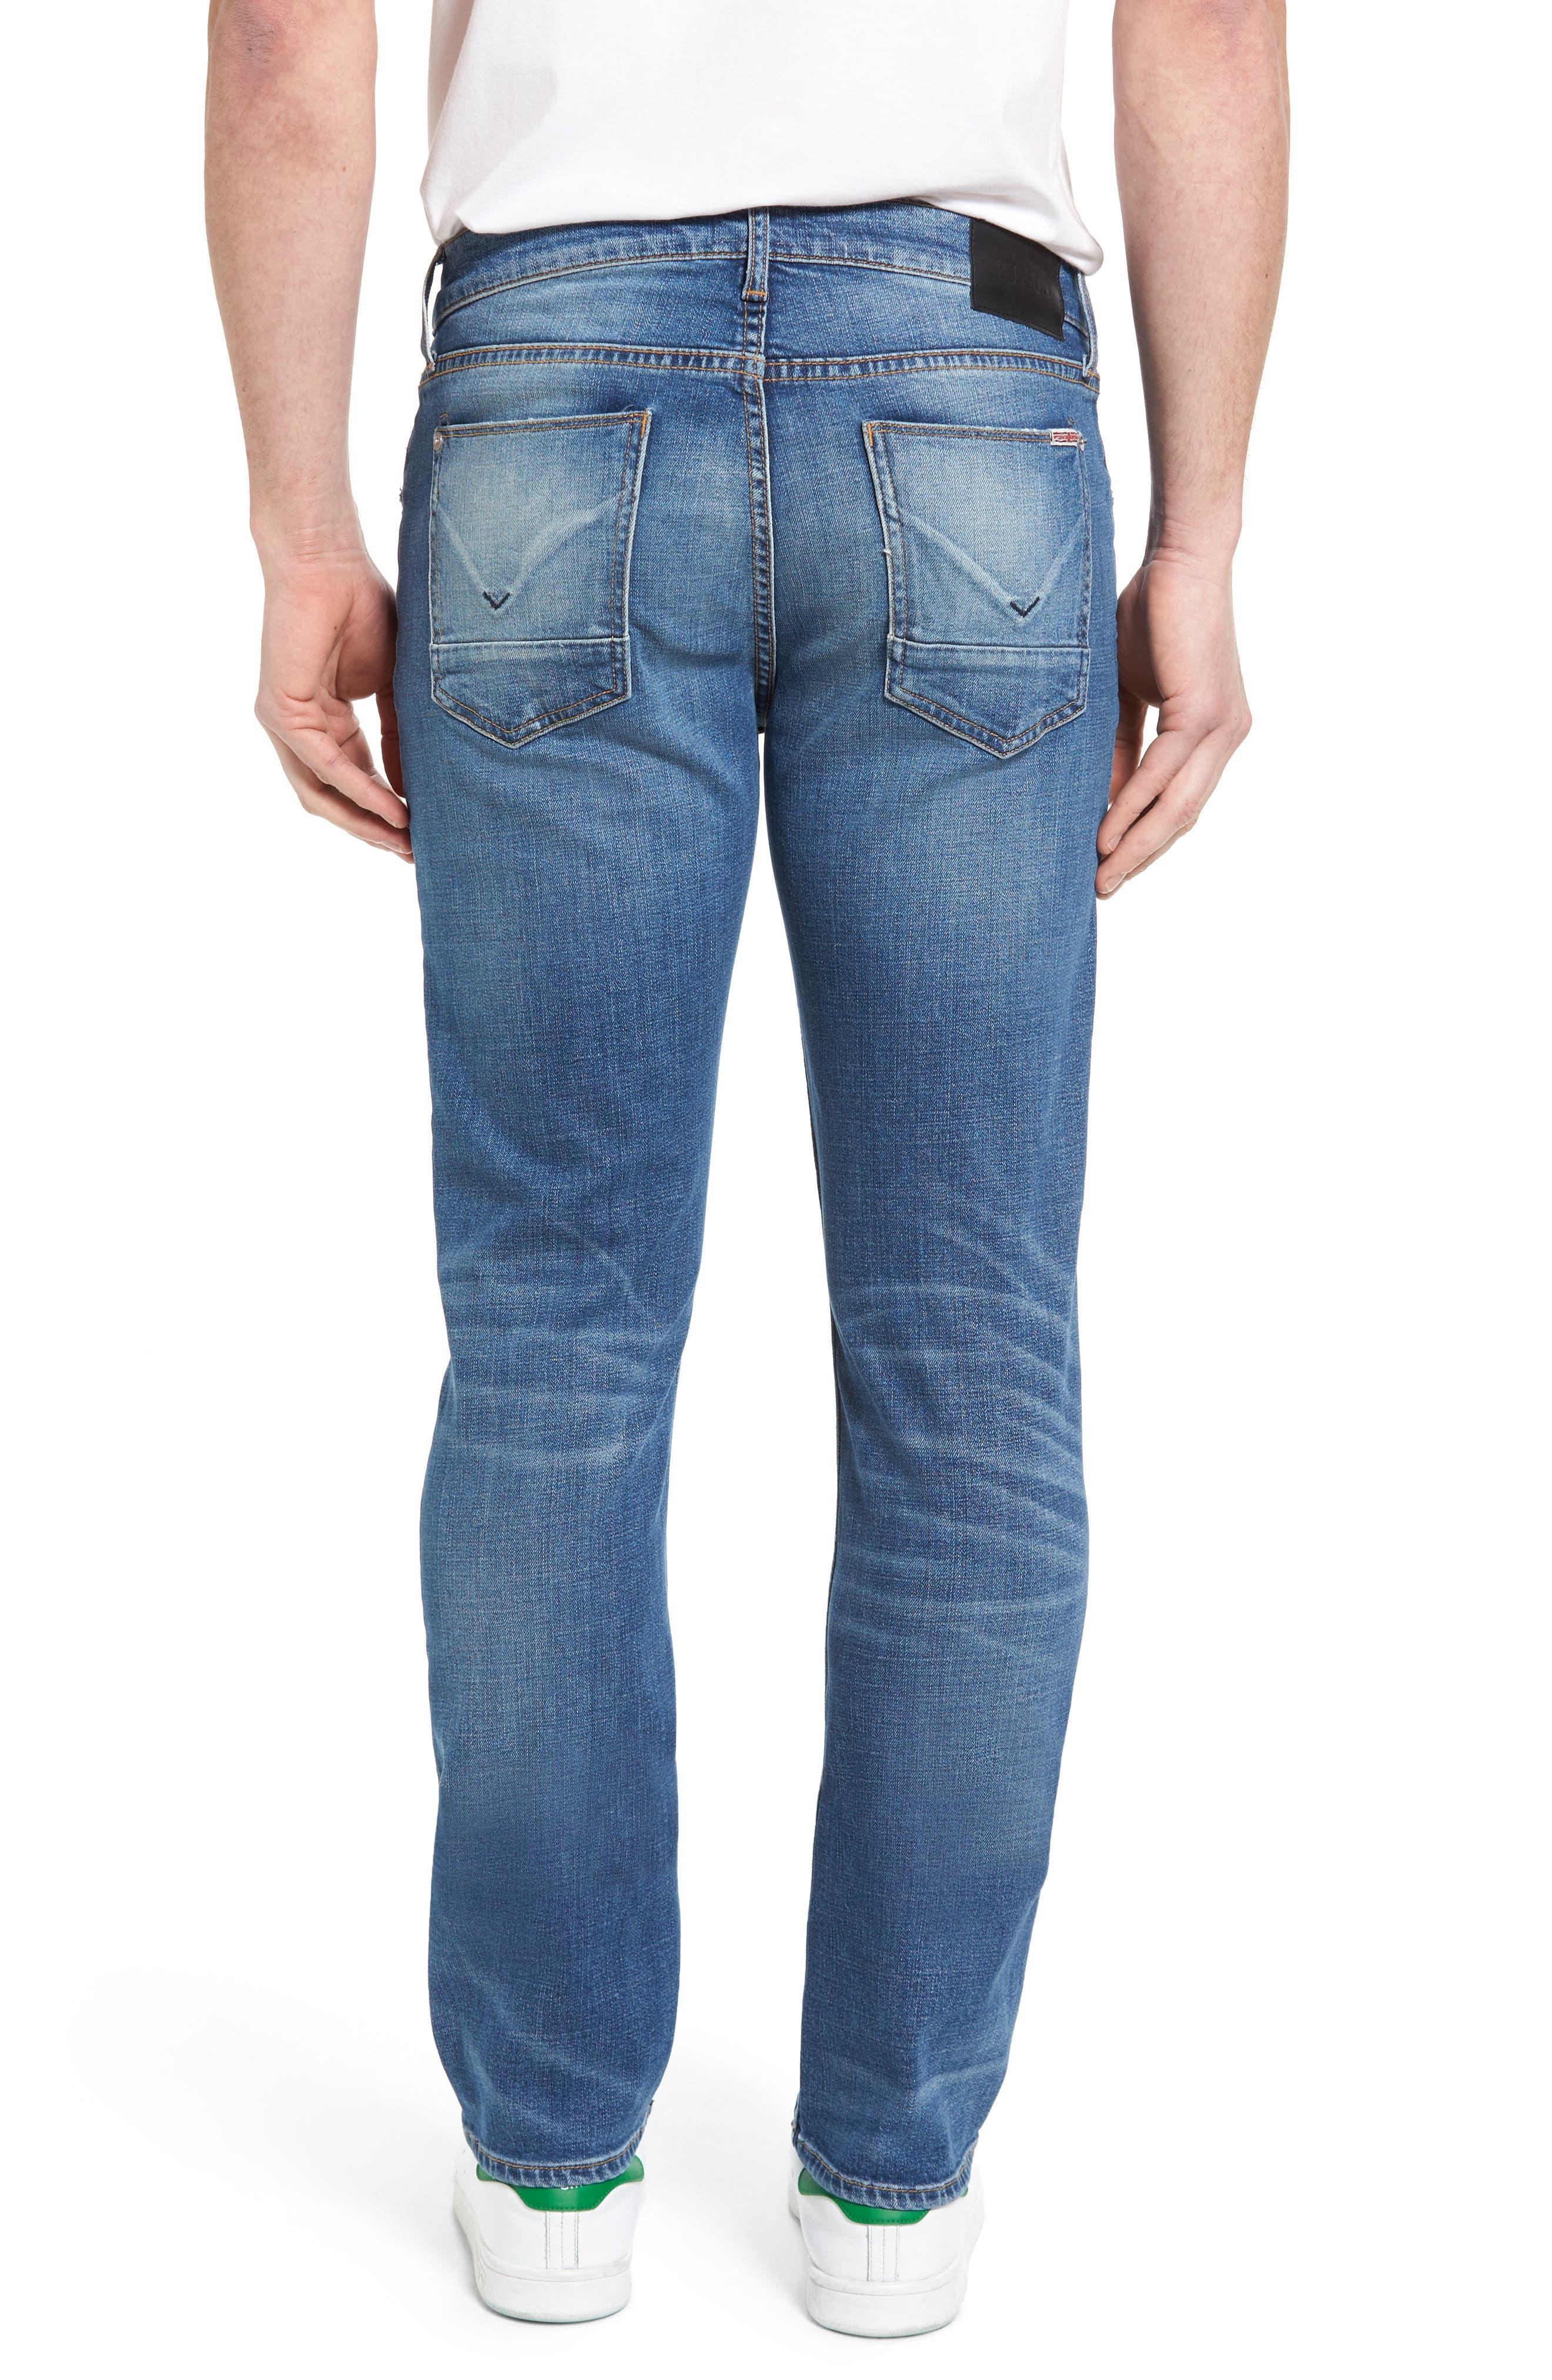 Byron Slim Straight Leg Jeans,                             Alternate thumbnail 2, color,                             453